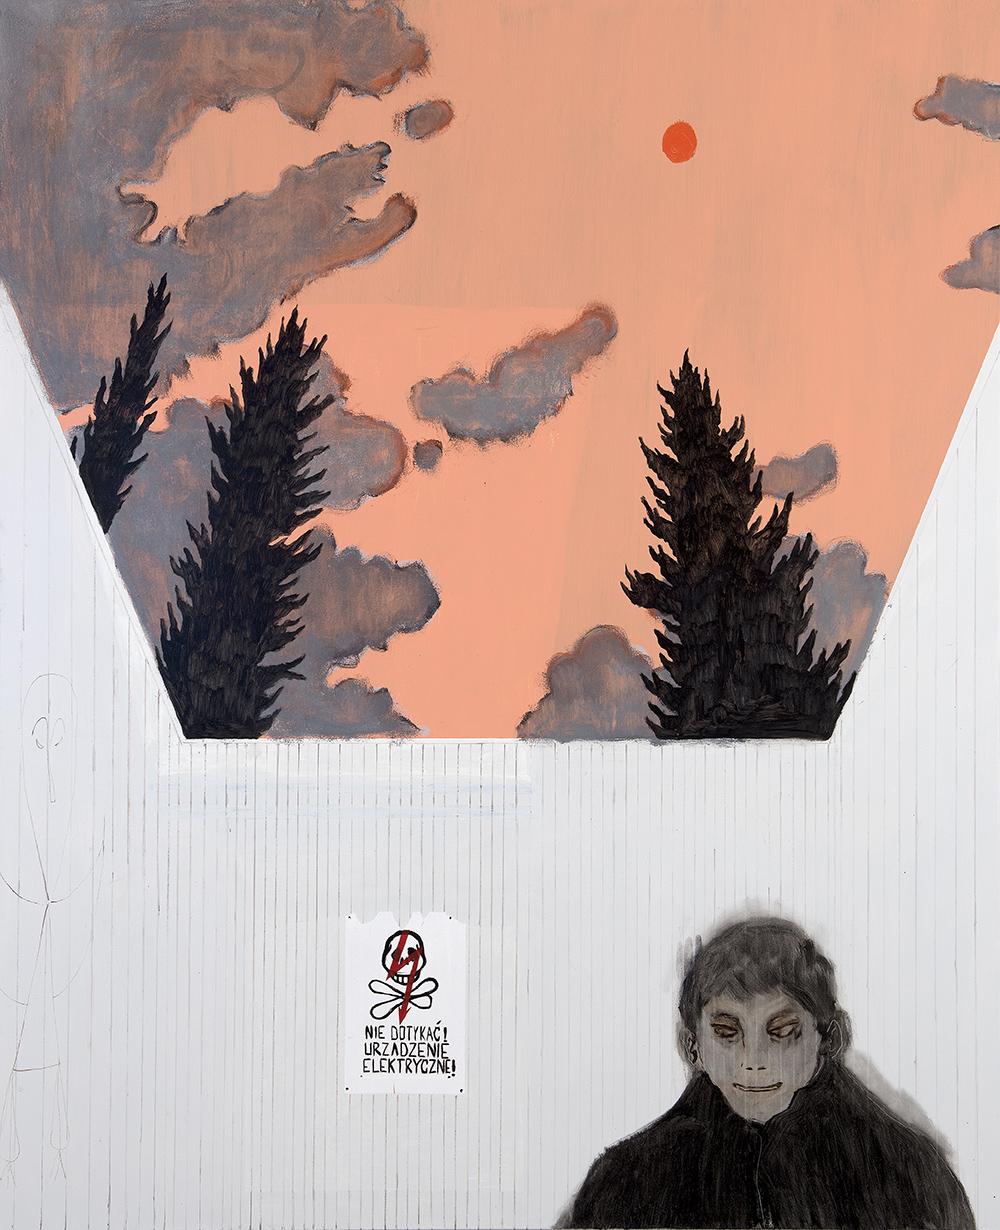 Francisco Rodriguez.<em> It will rain</em>, 2019. Oil on canvas, 82 5/8 x 66 7/8 inches (210 x 170 cm)